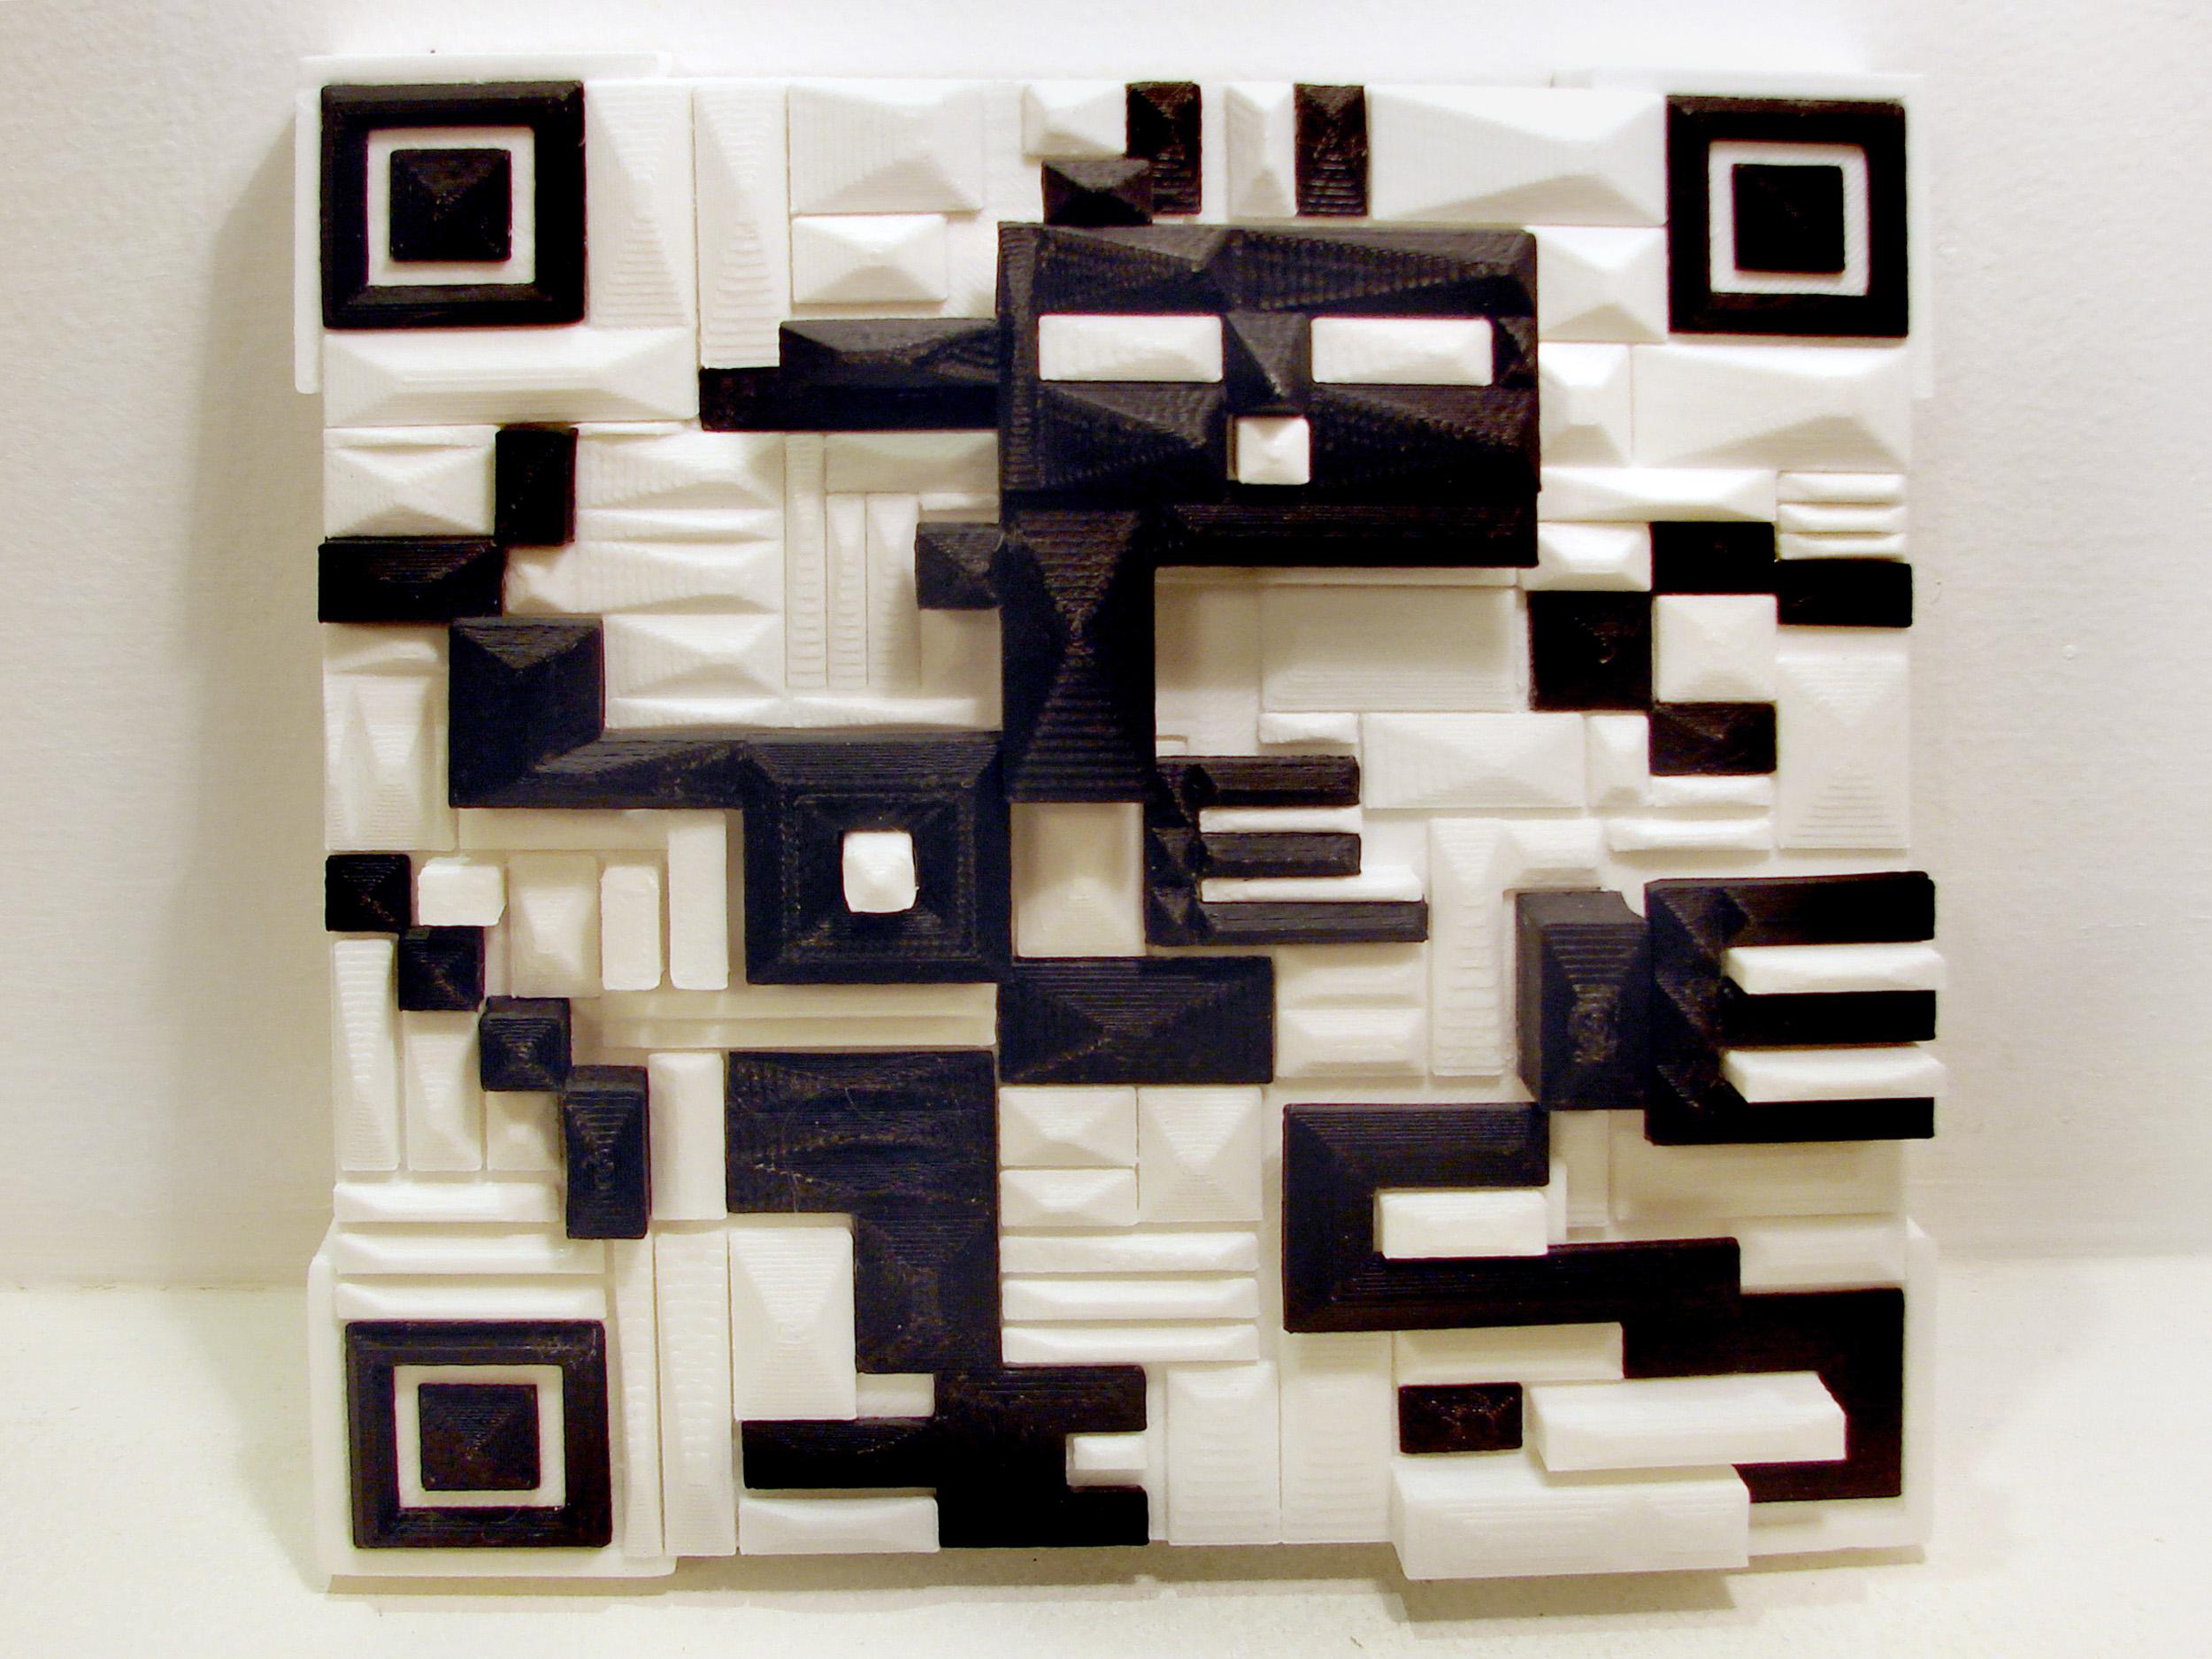 Galina_Bleikh_QR_(Quick_Recognition_Code)_#4_3d-printing_ABS_plastic_18x18cm.jpg